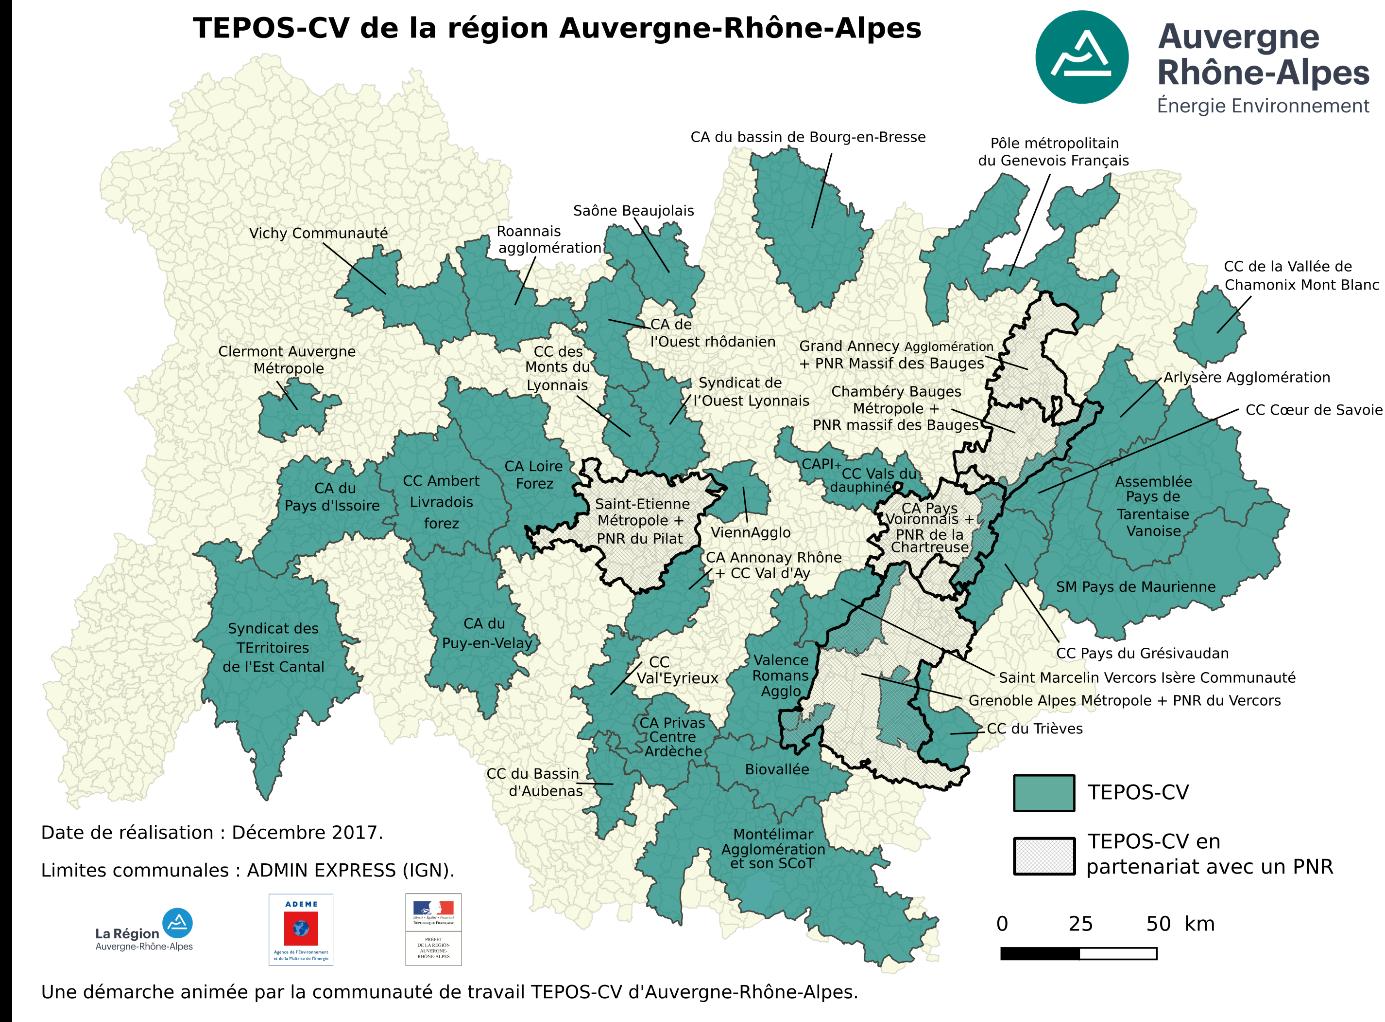 Cartographie des TEPOS-CV en Auvergne-Rhône-Alpes